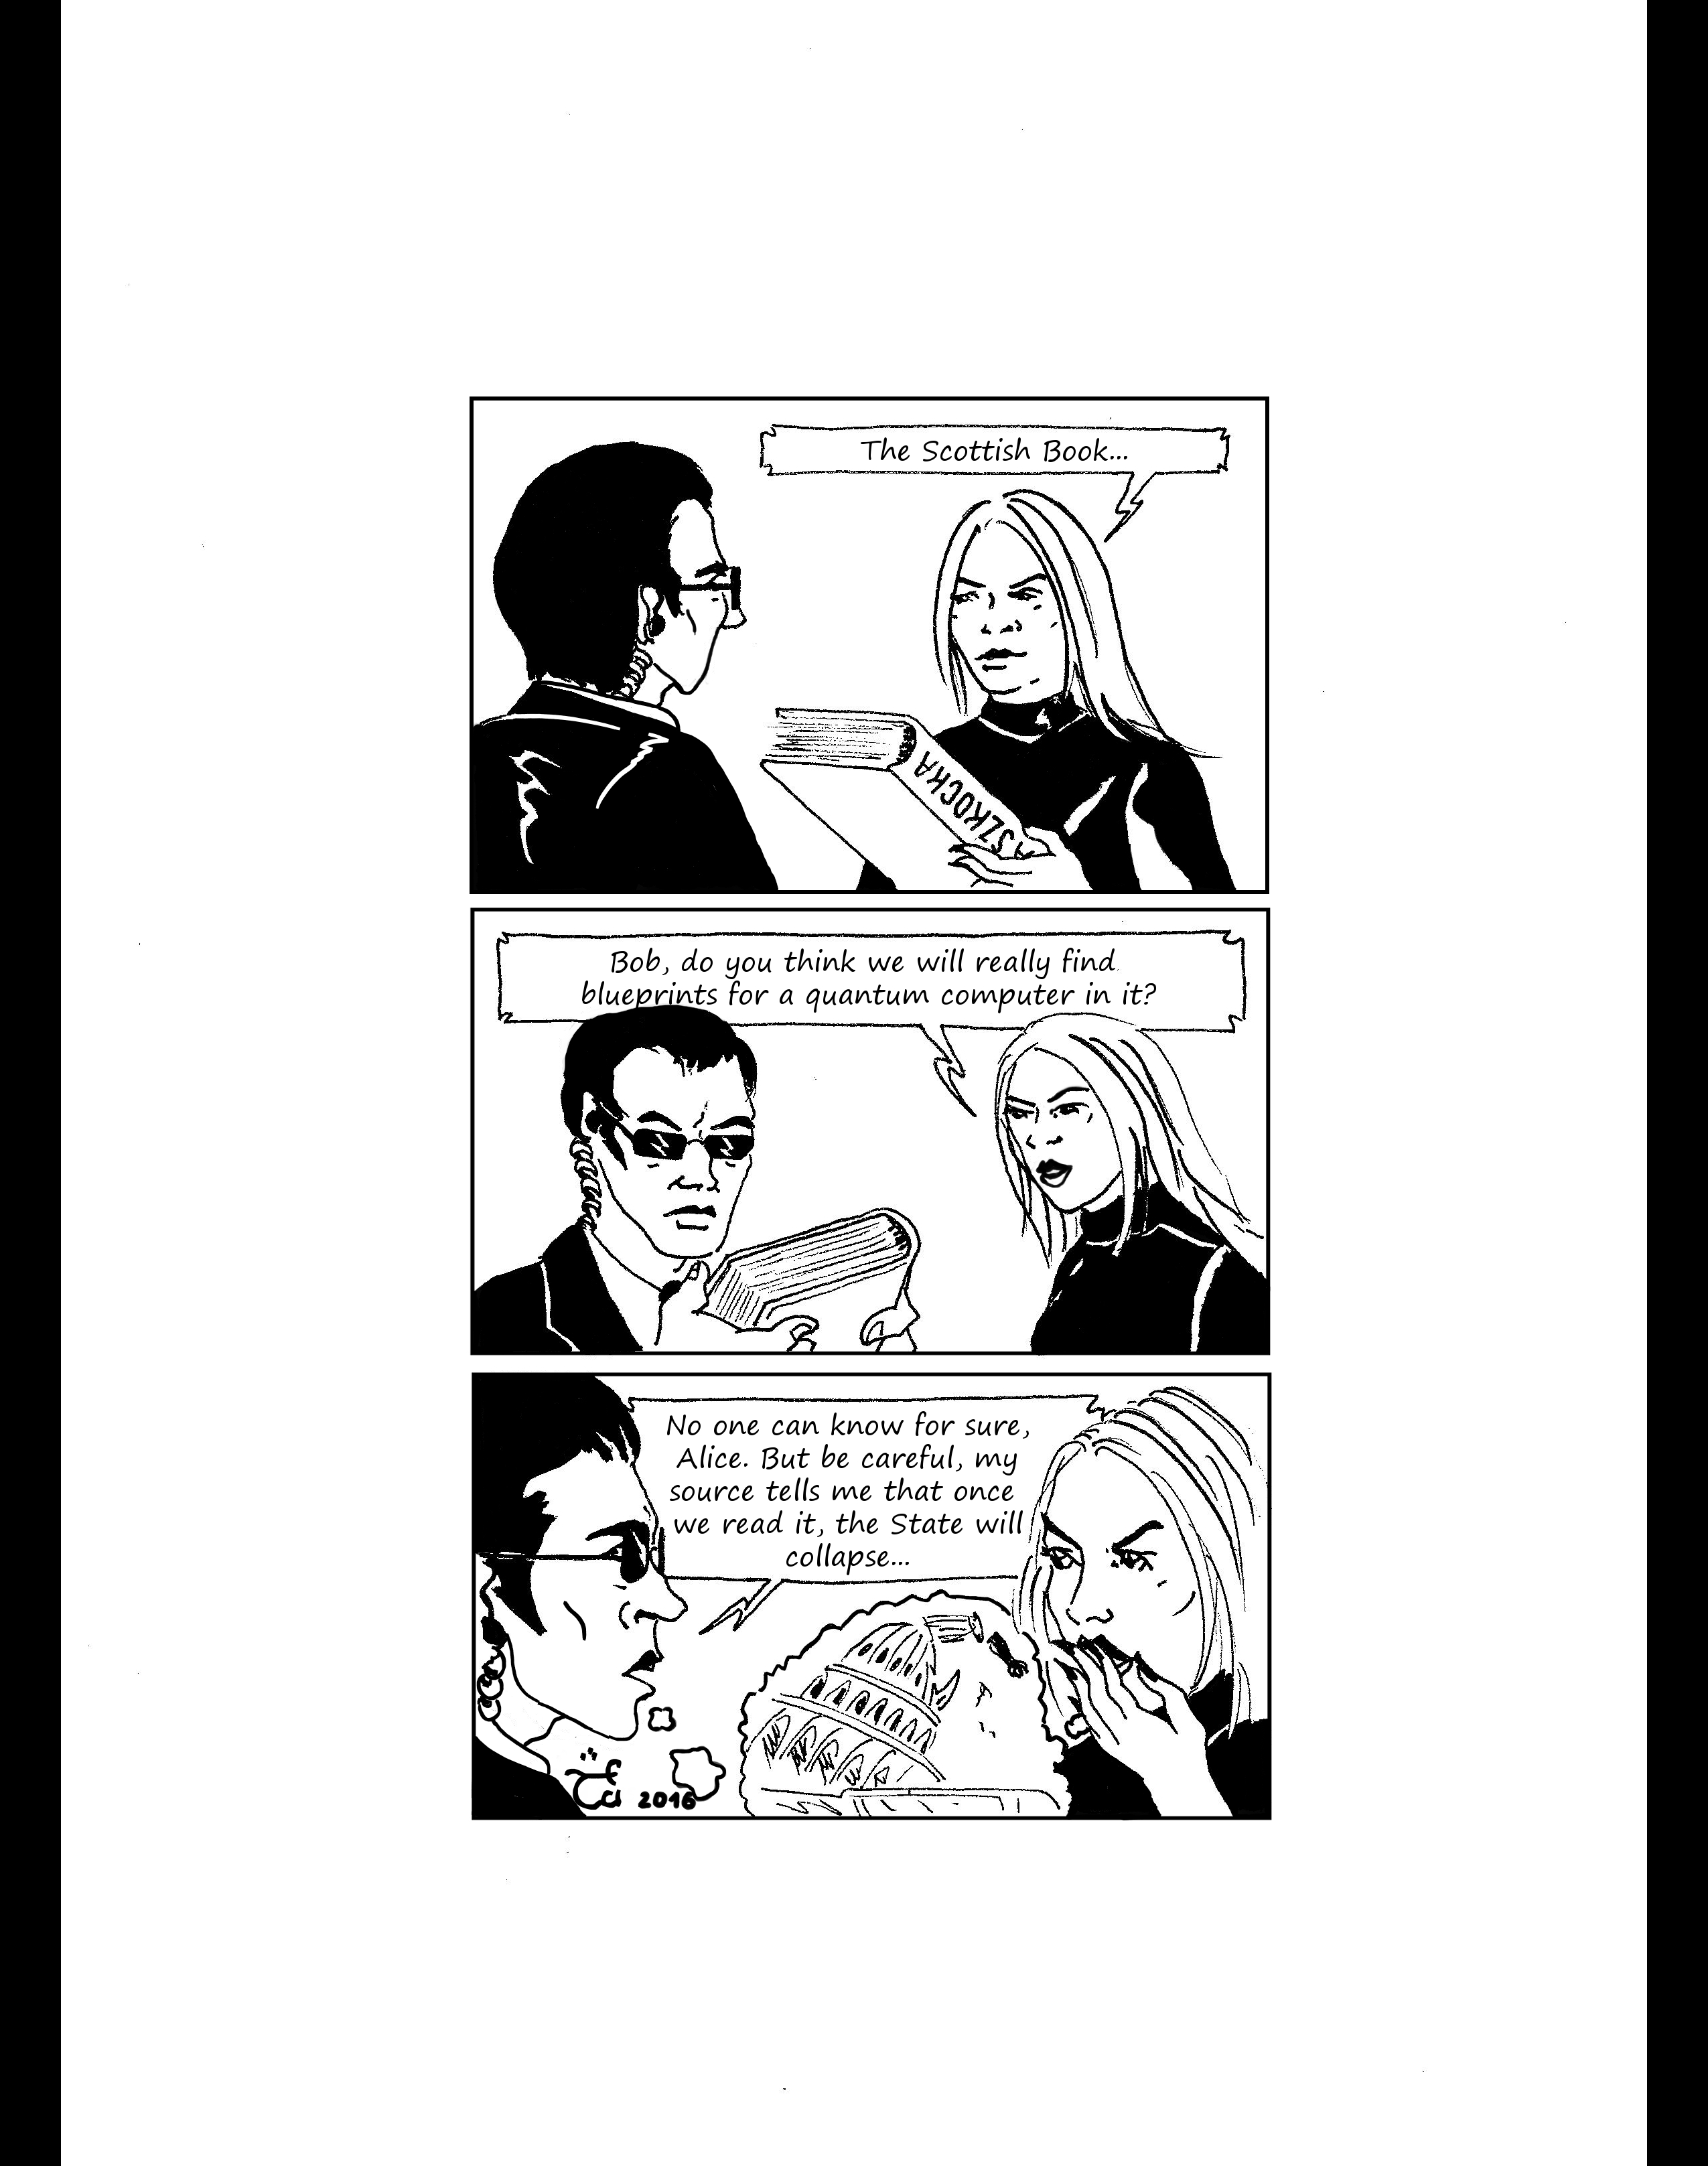 A cartoon